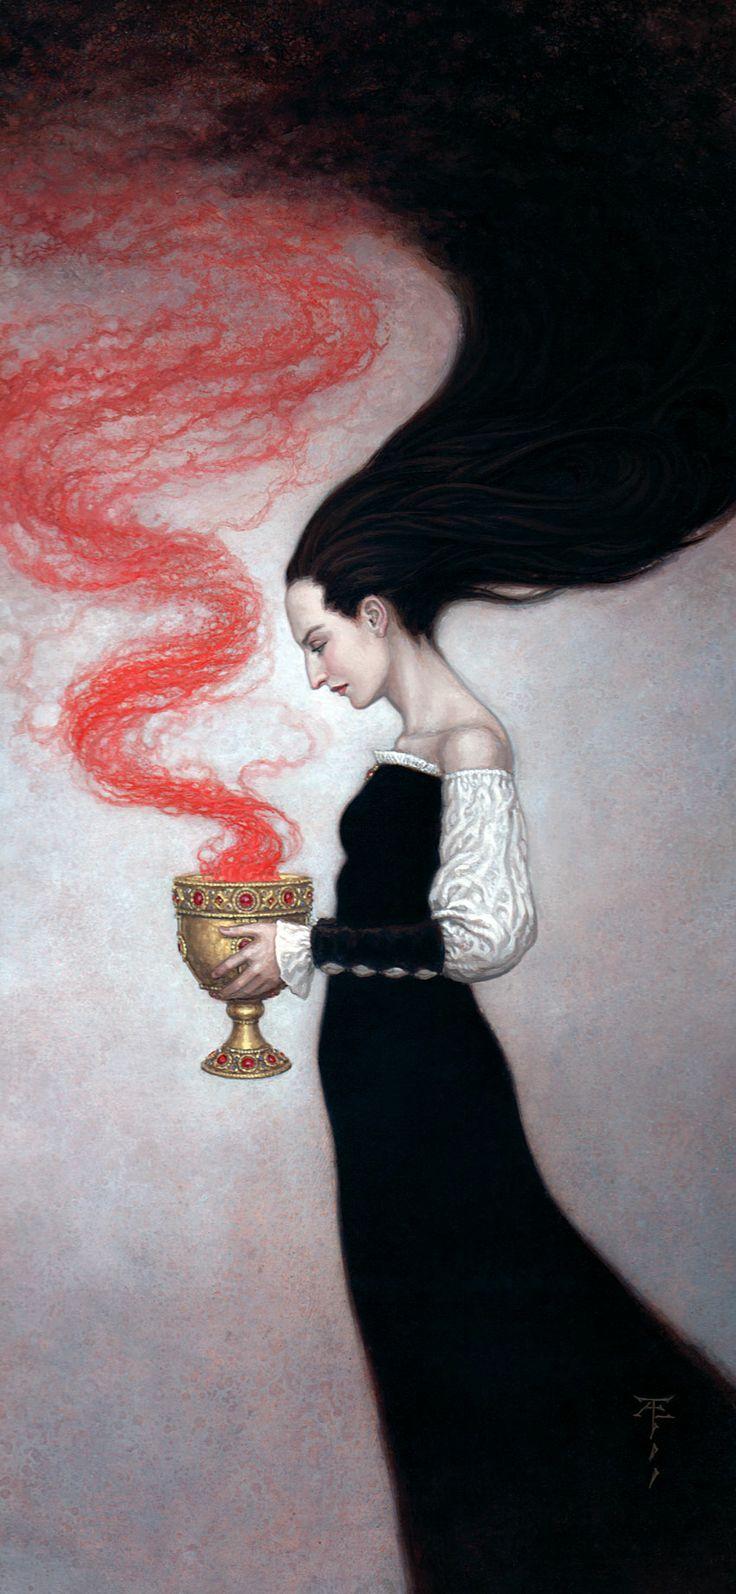 Morgana, an art print by Tristan Elwell